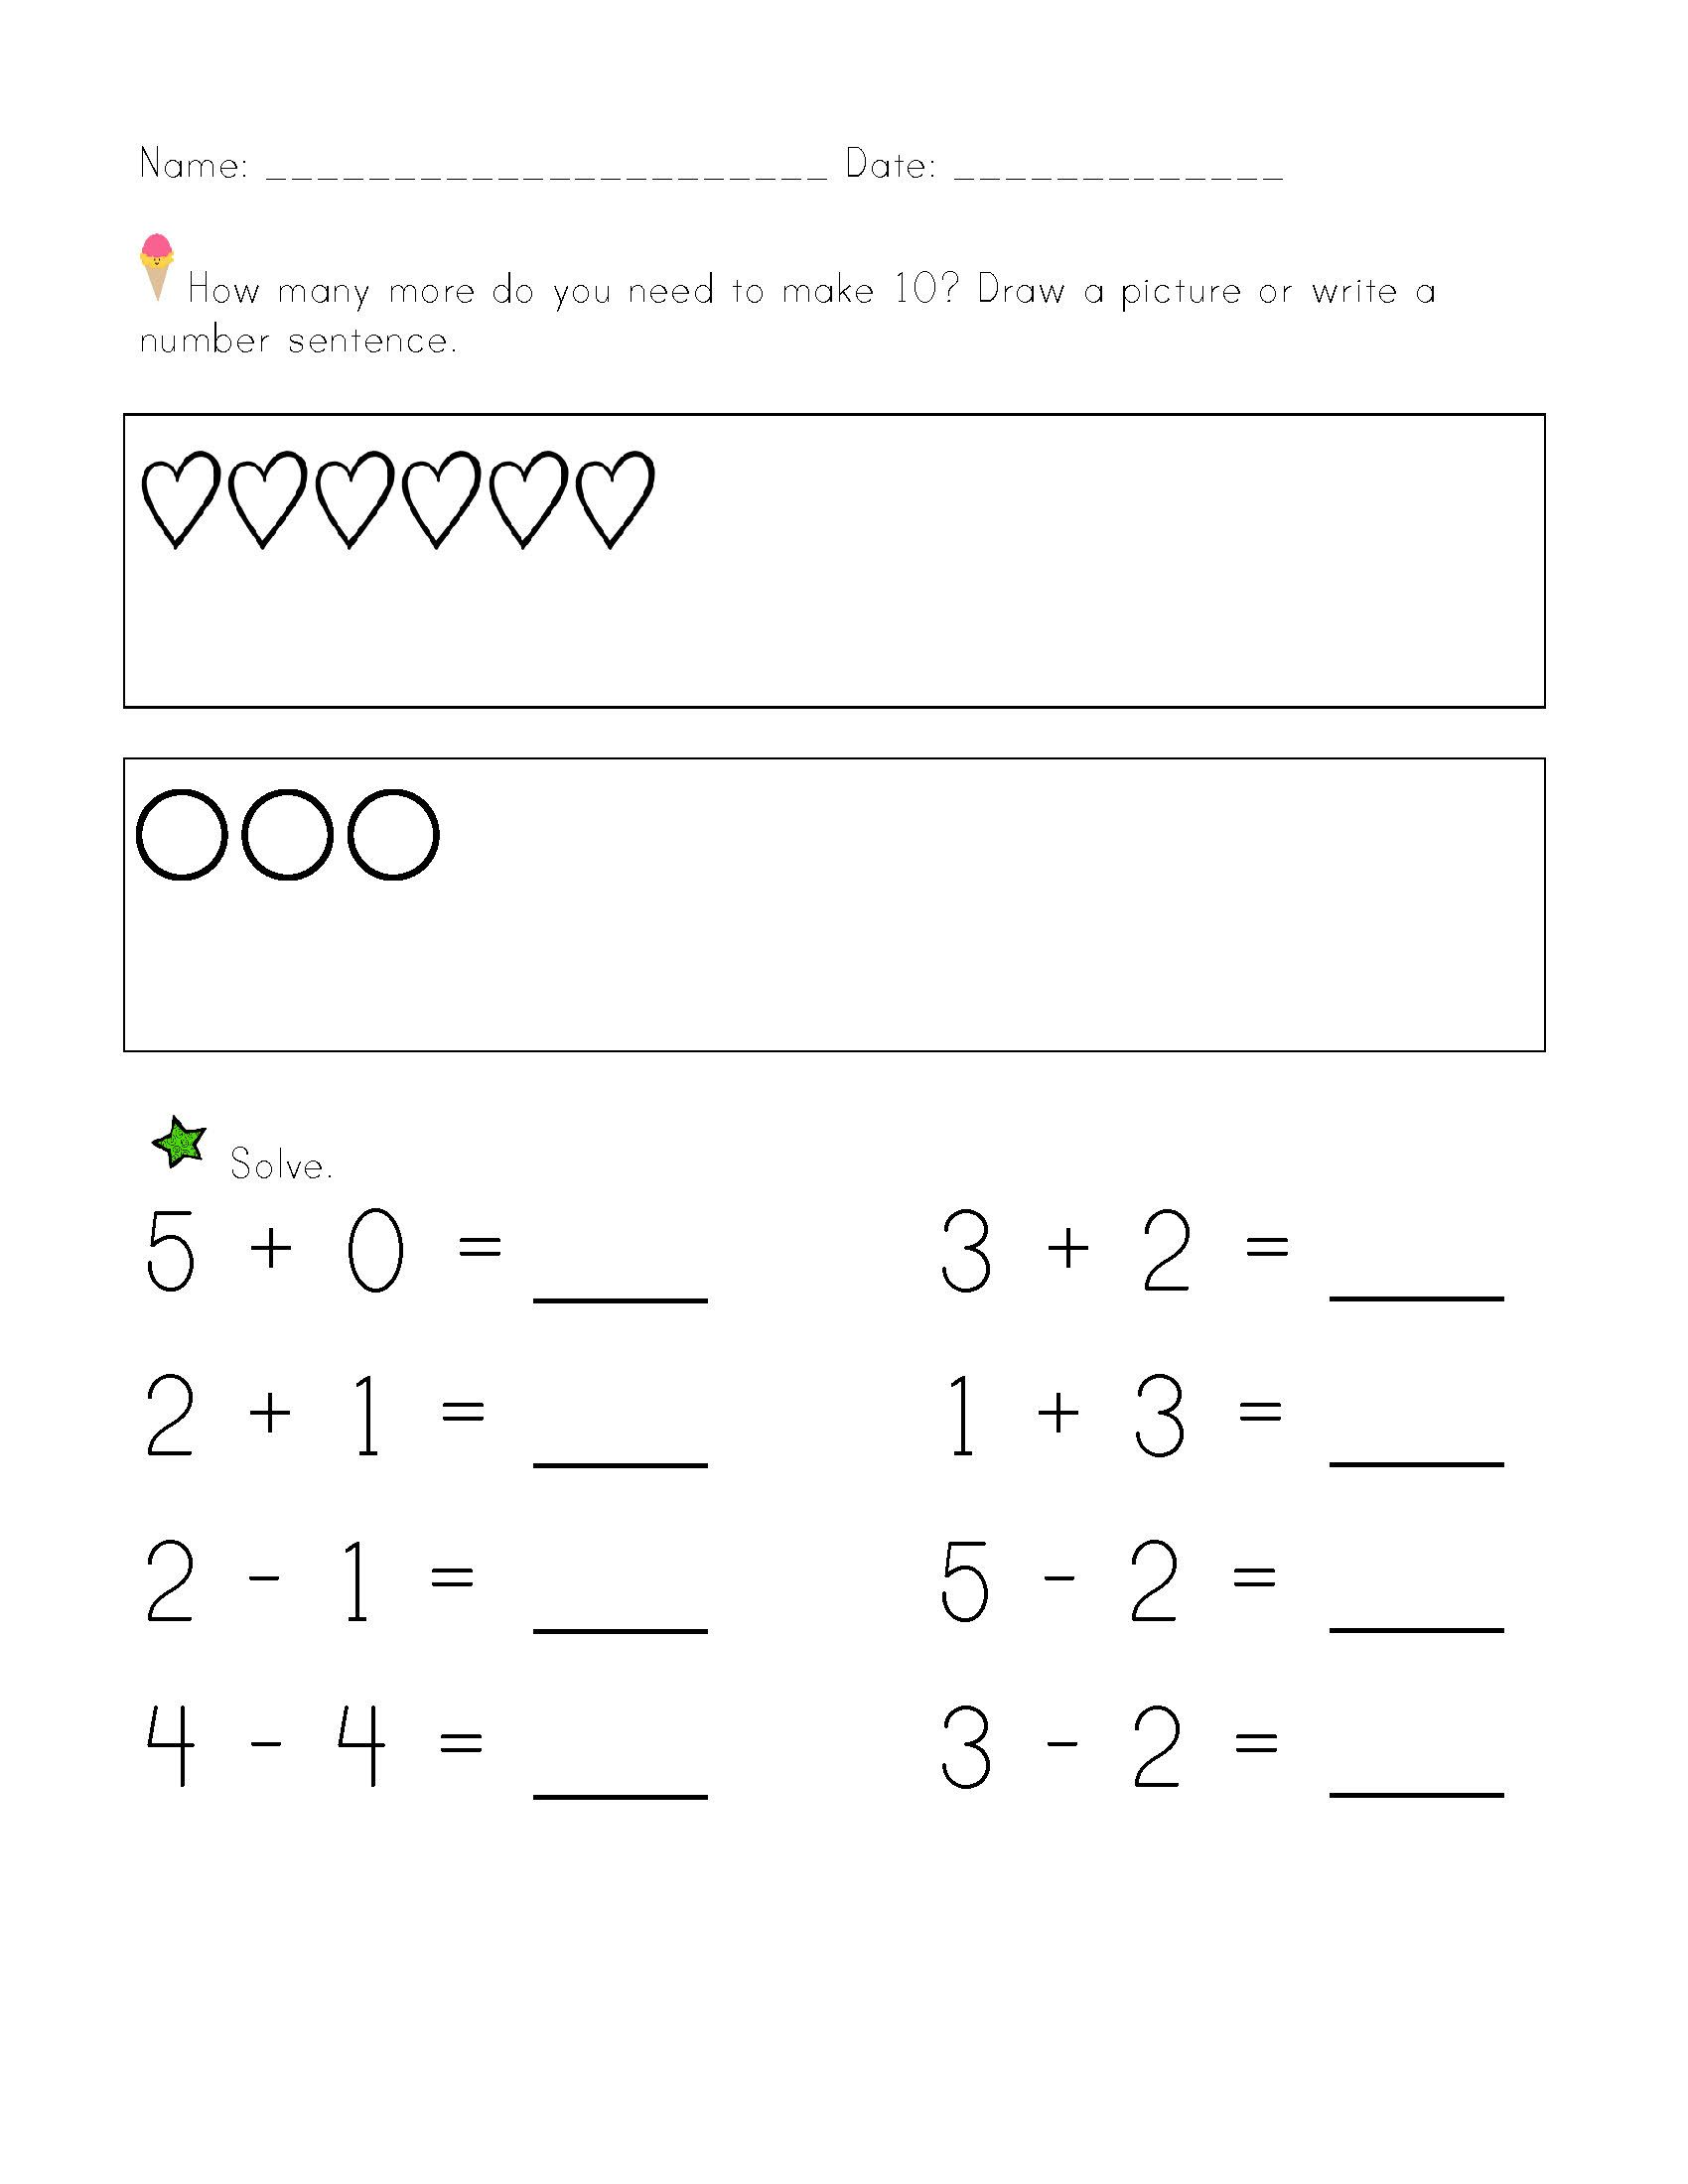 medium resolution of Algebraic Thinking Worksheets For Kindergarten   Printable Worksheets and  Activities for Teachers